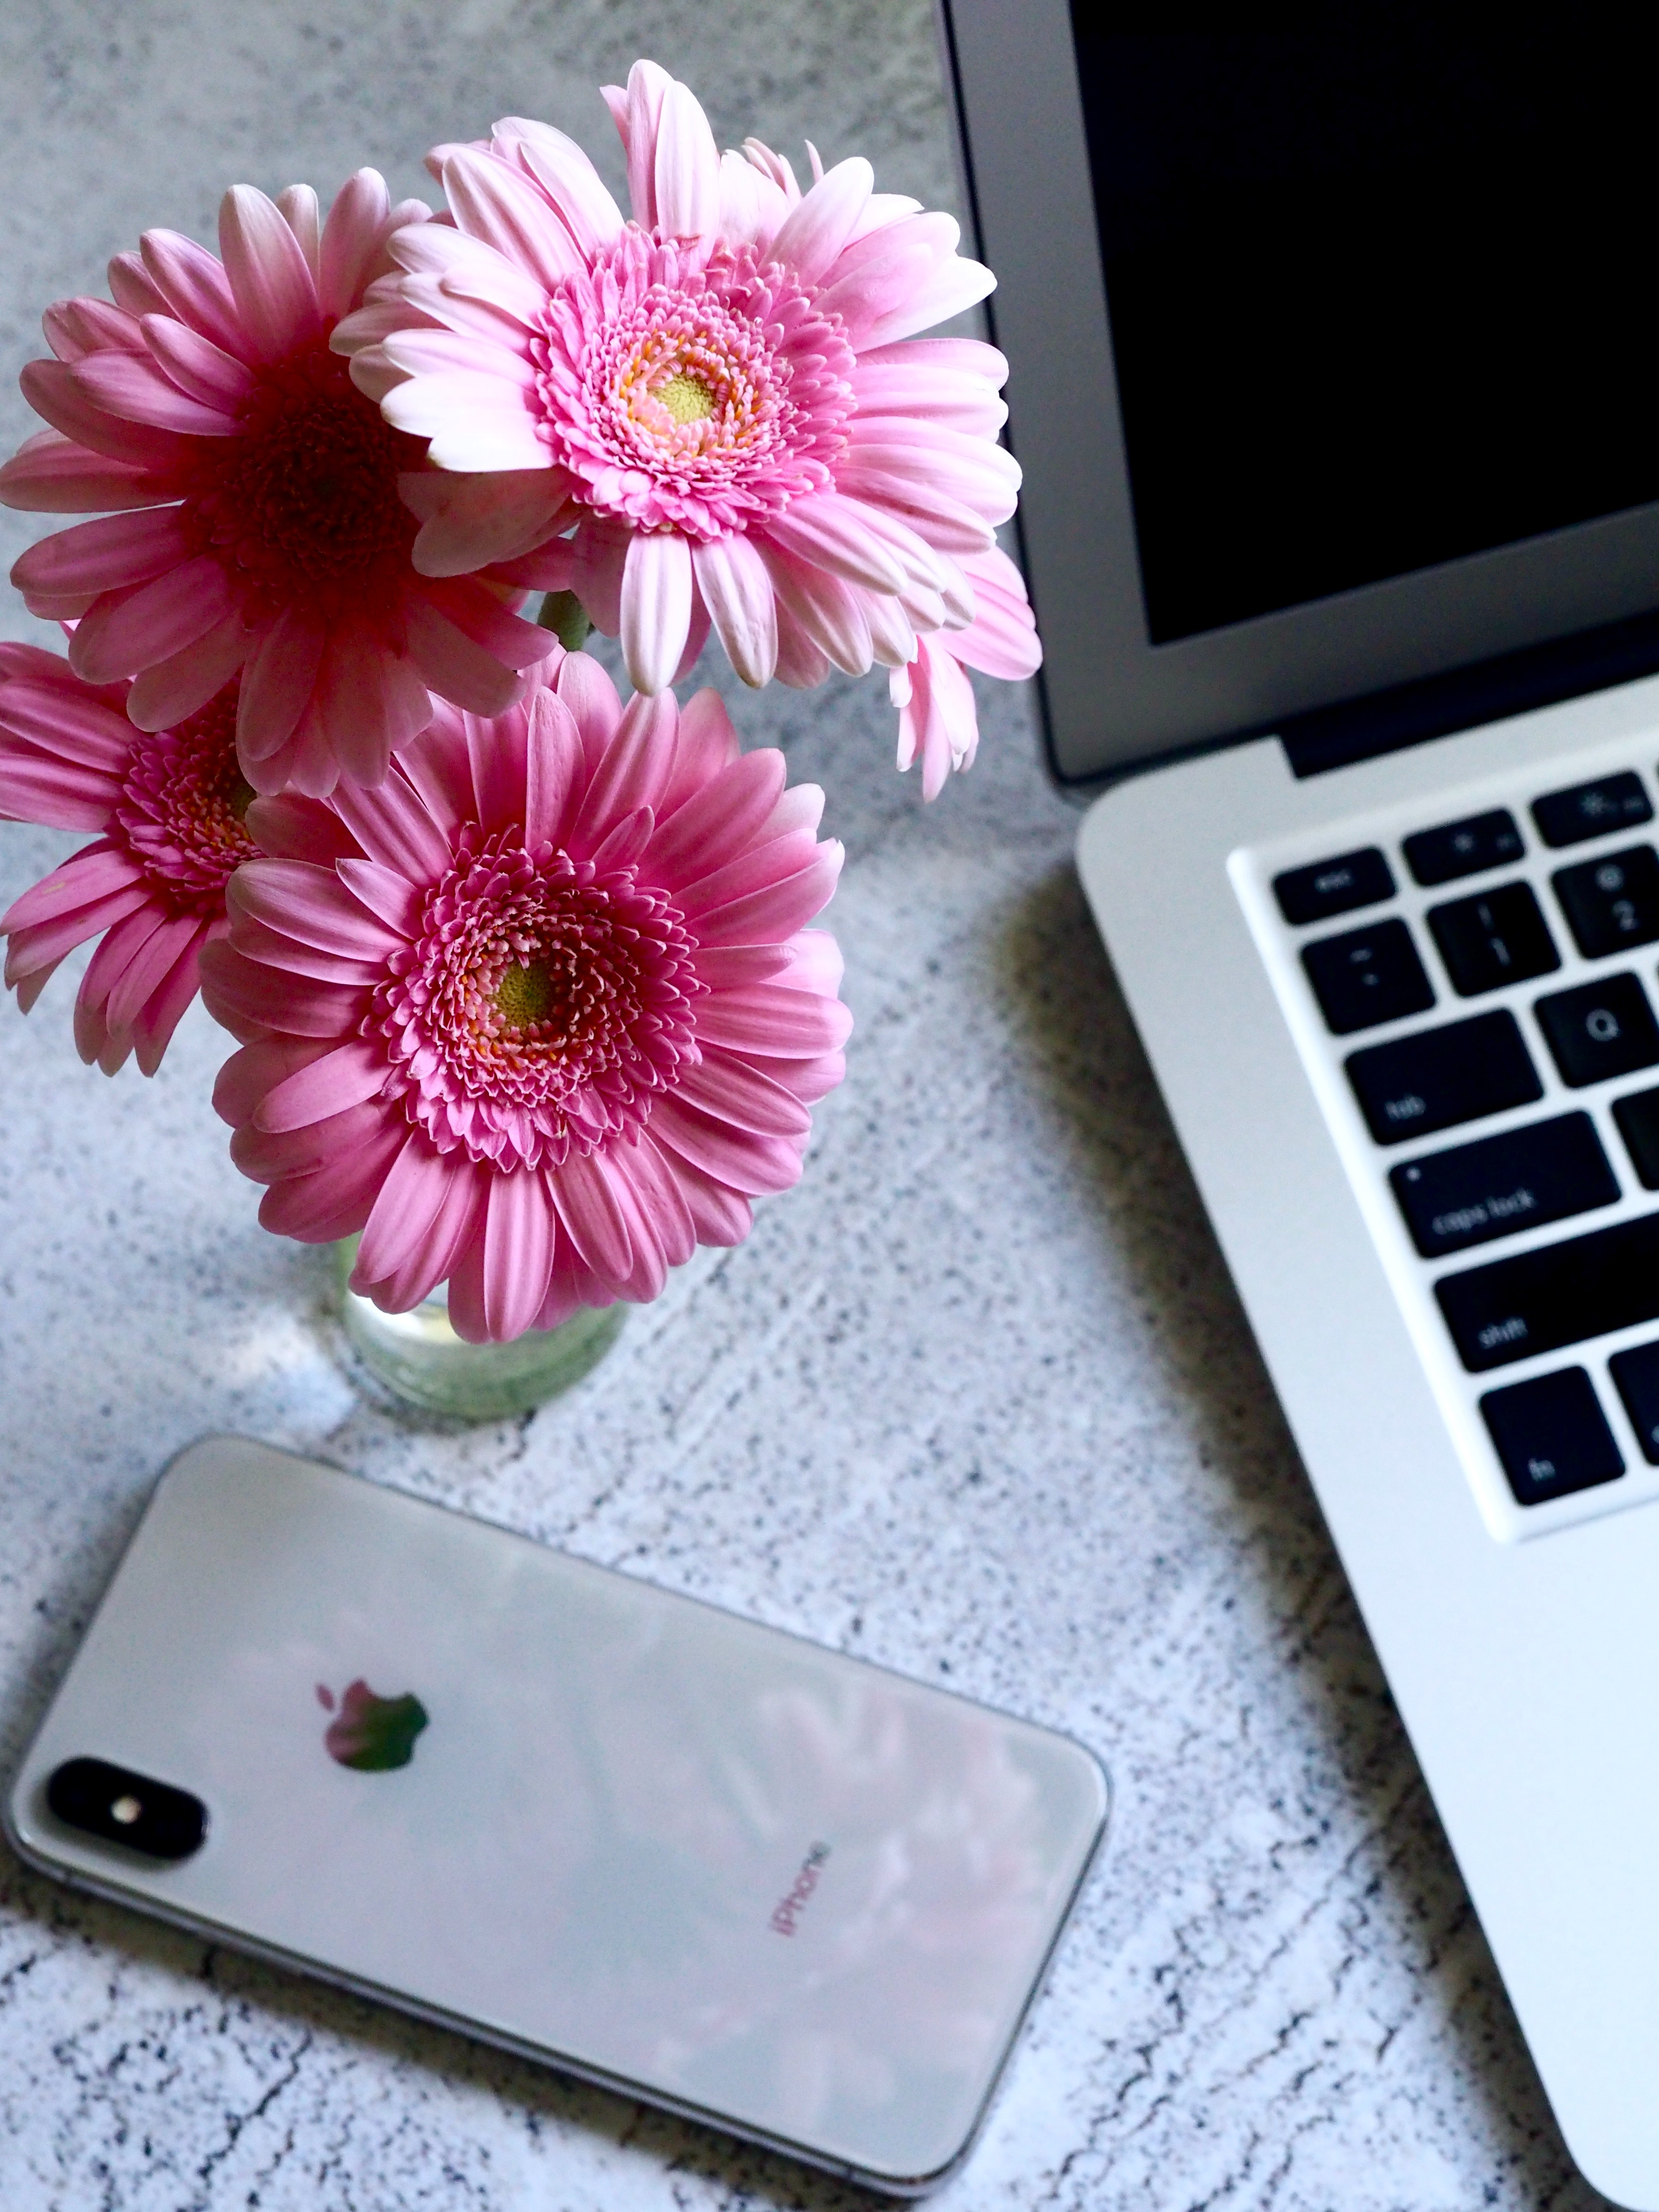 apple_mac_wedding_planner_business